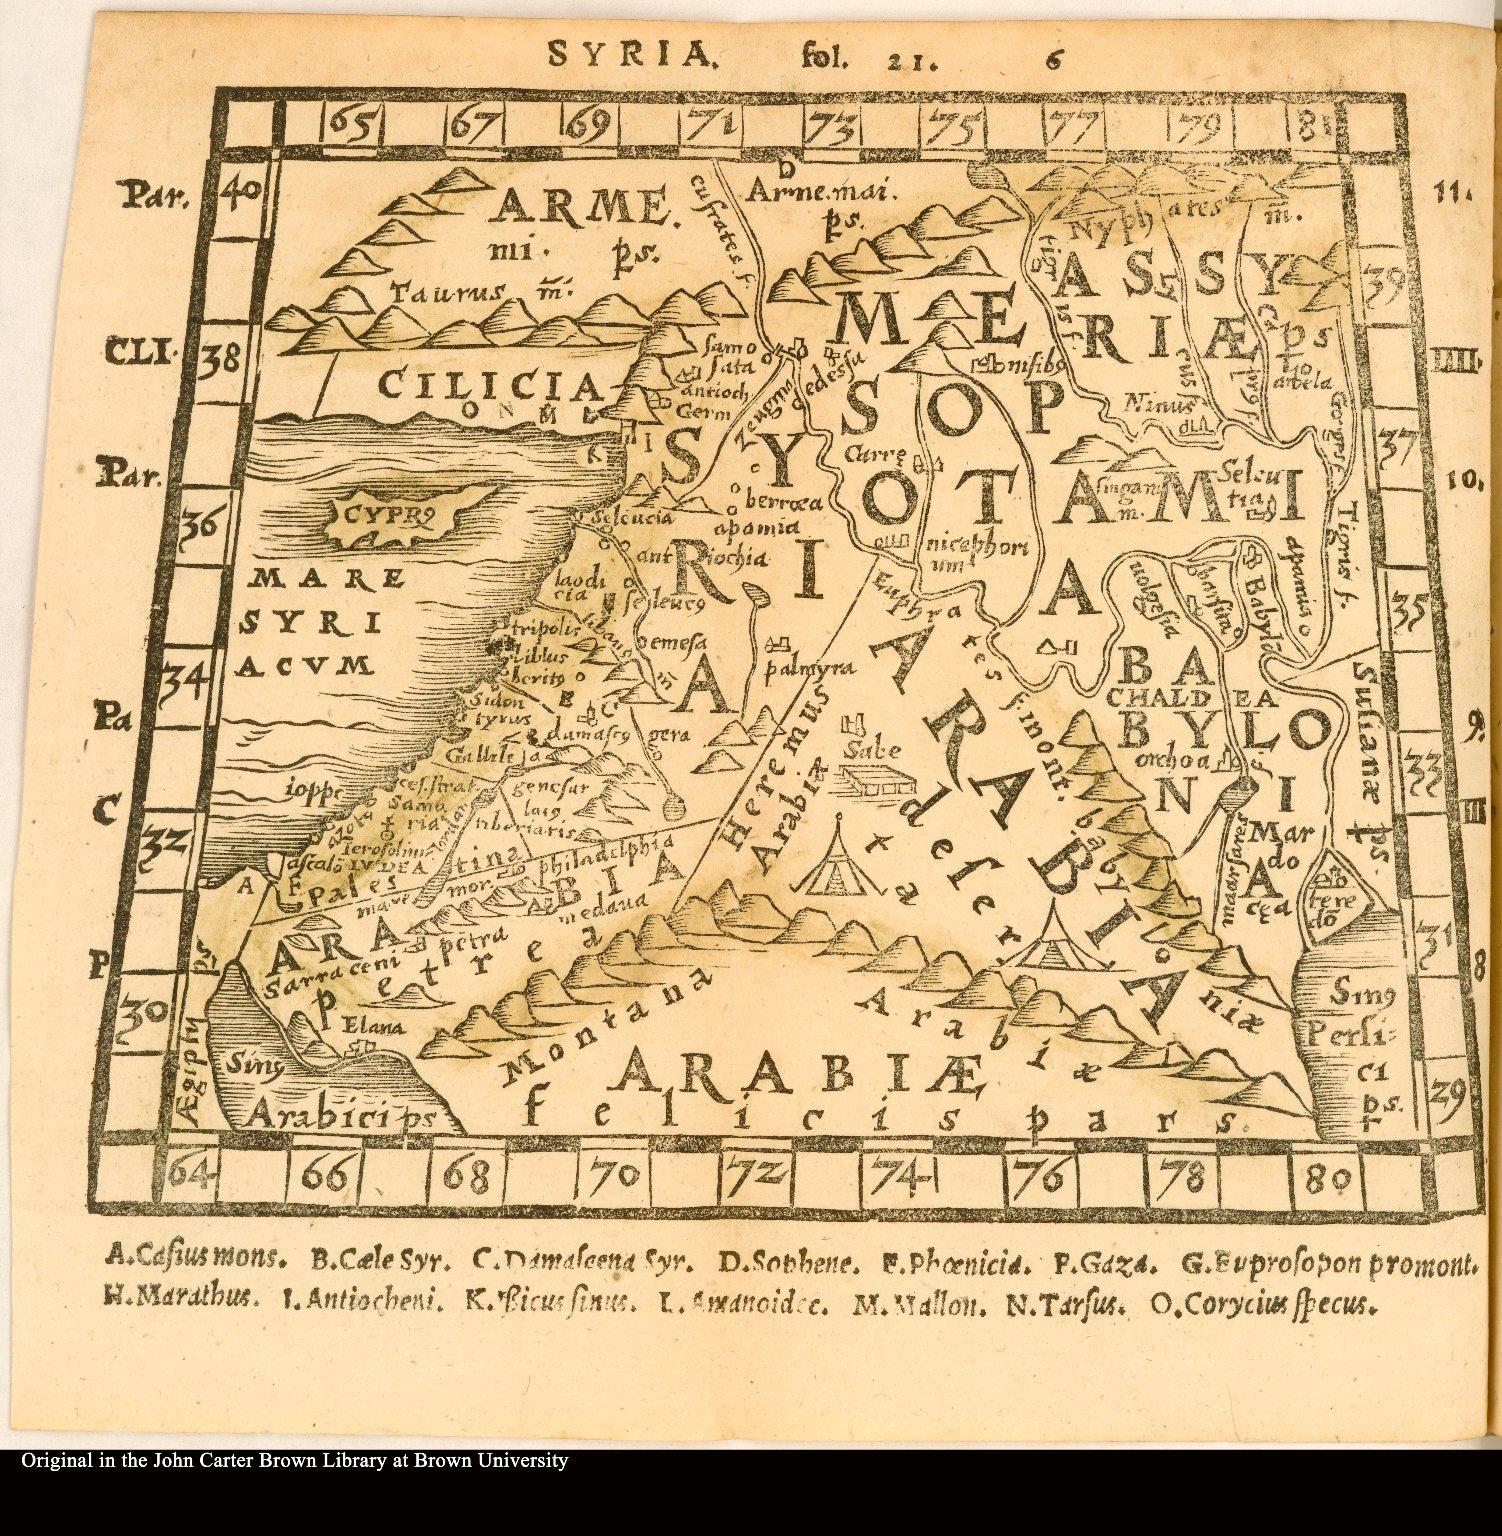 Syria [Middle East, Mesopotamia, Syria, Babylonia, and the Arabian peninsula]